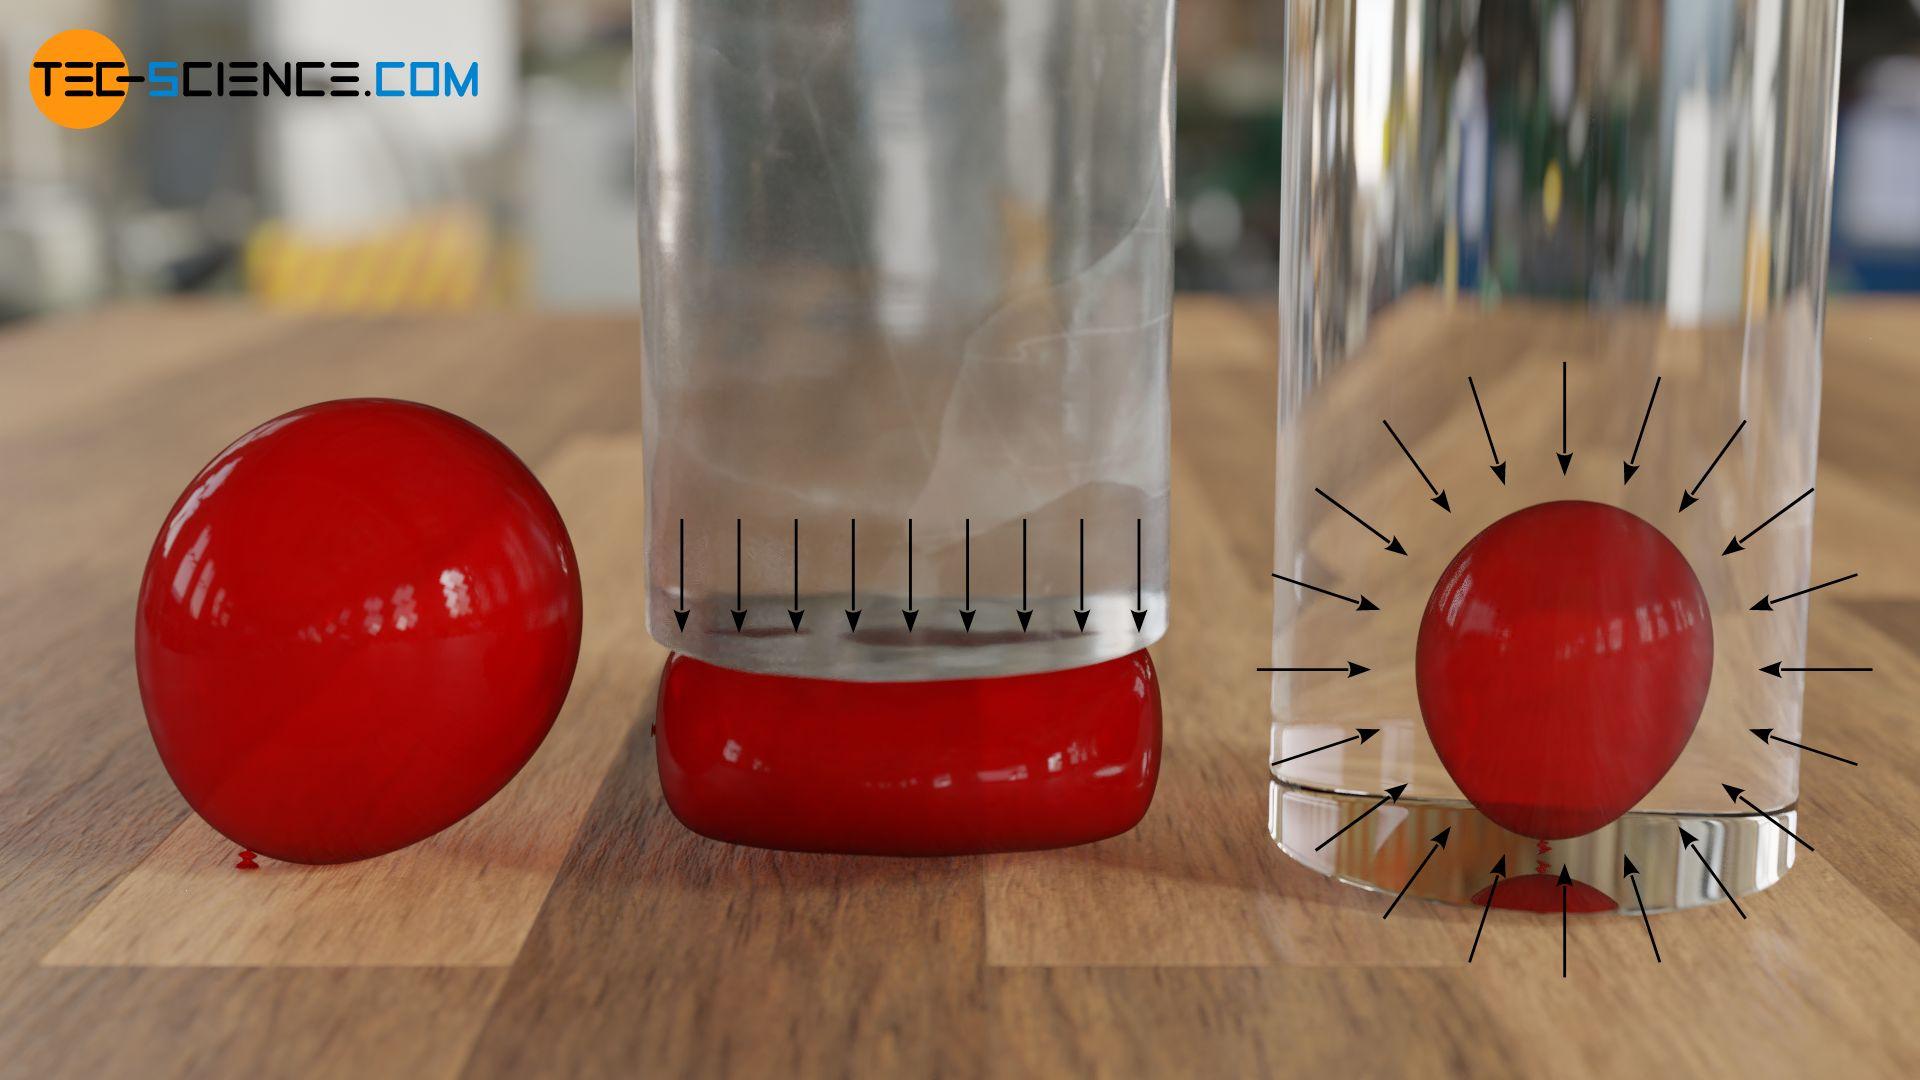 Pressure effect of the hydrostatic pressure compared to the contact pressure